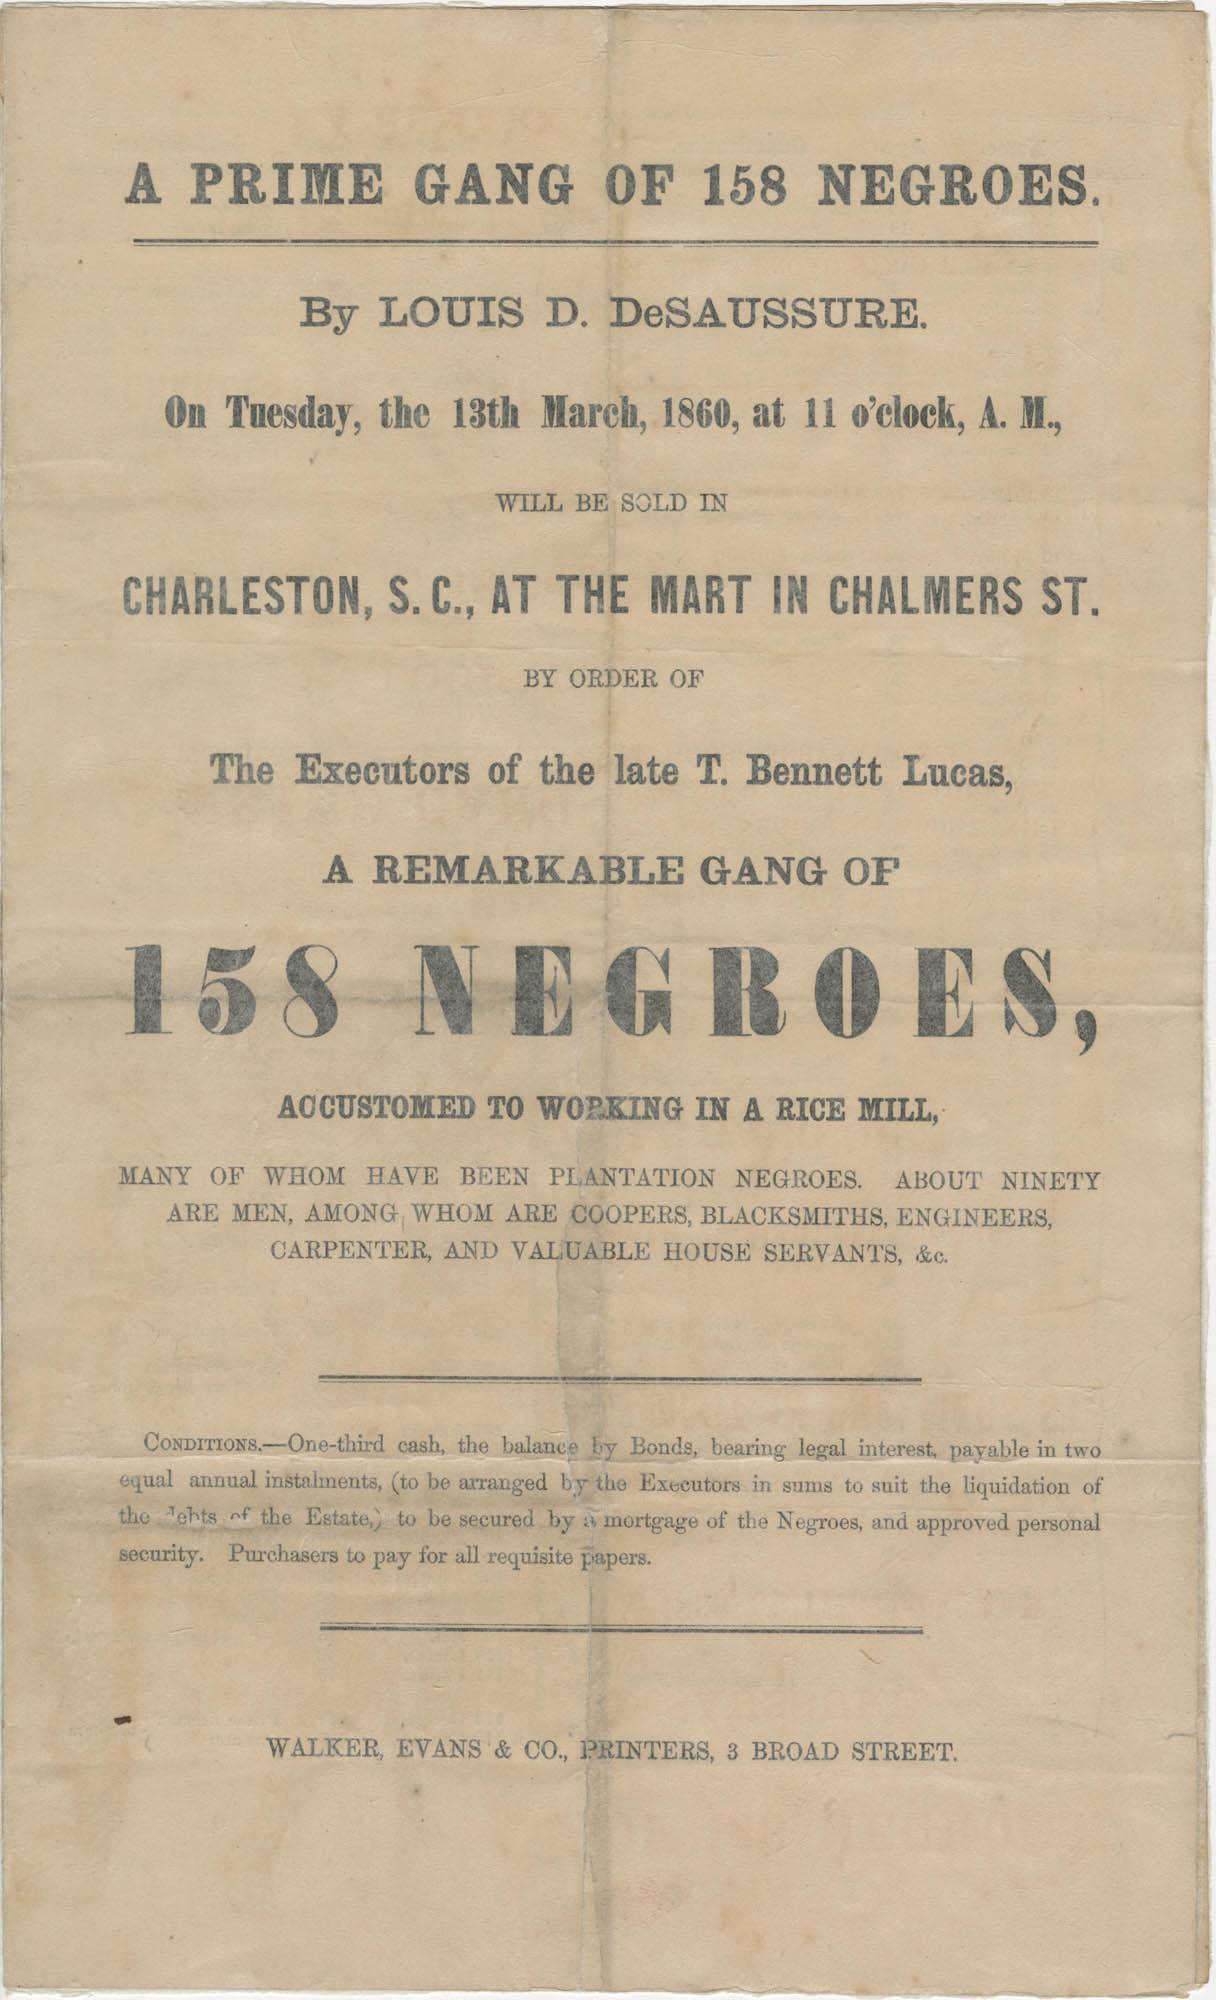 Louis D. DeSaussure slave sale broadside